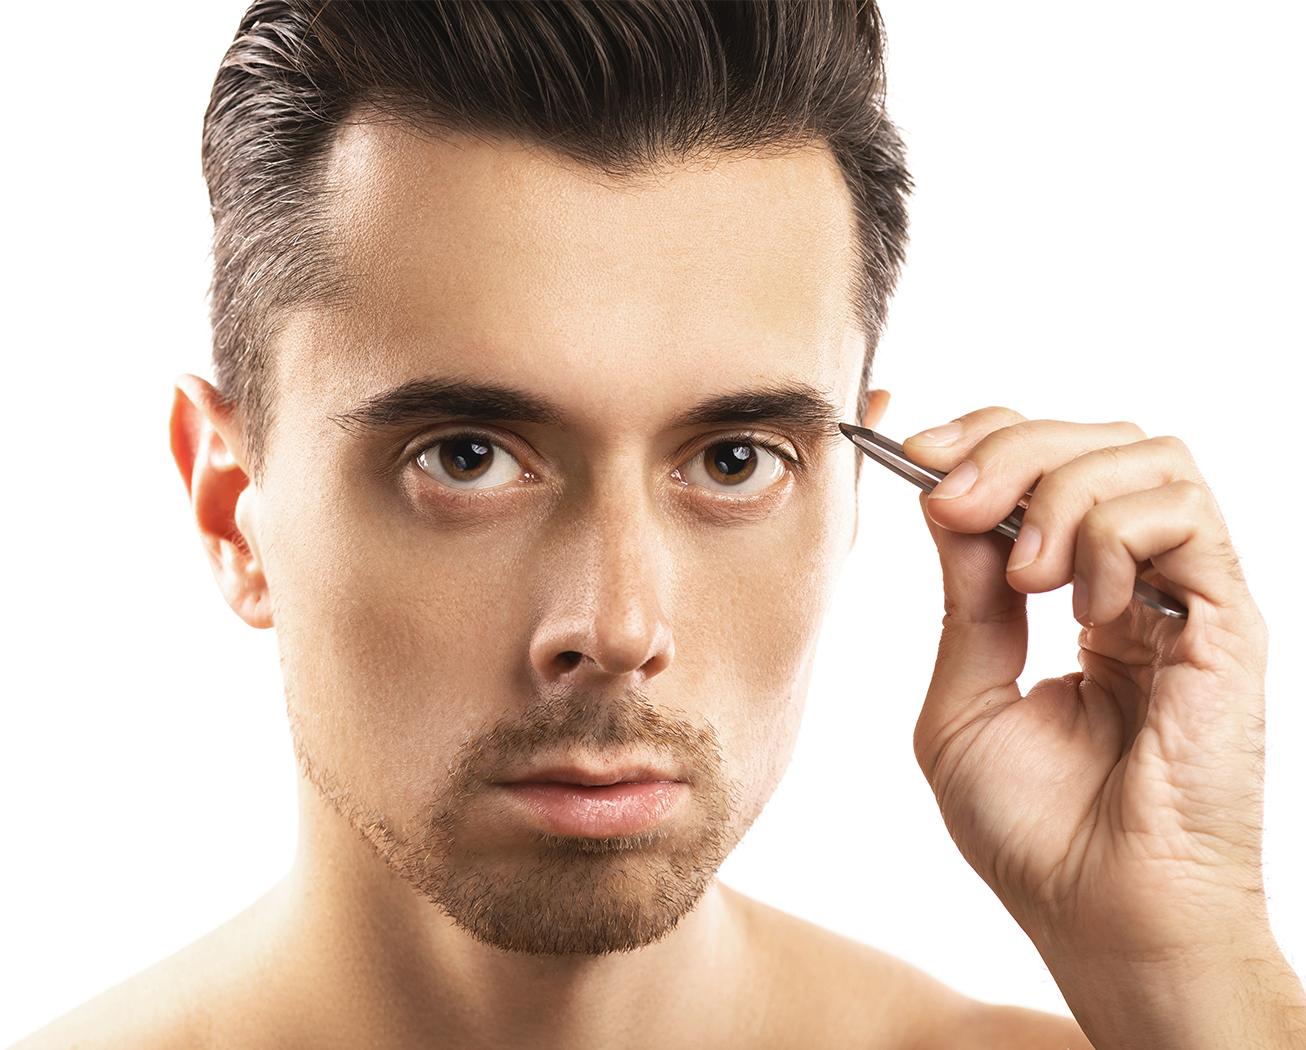 Man Plucking Eyebrow